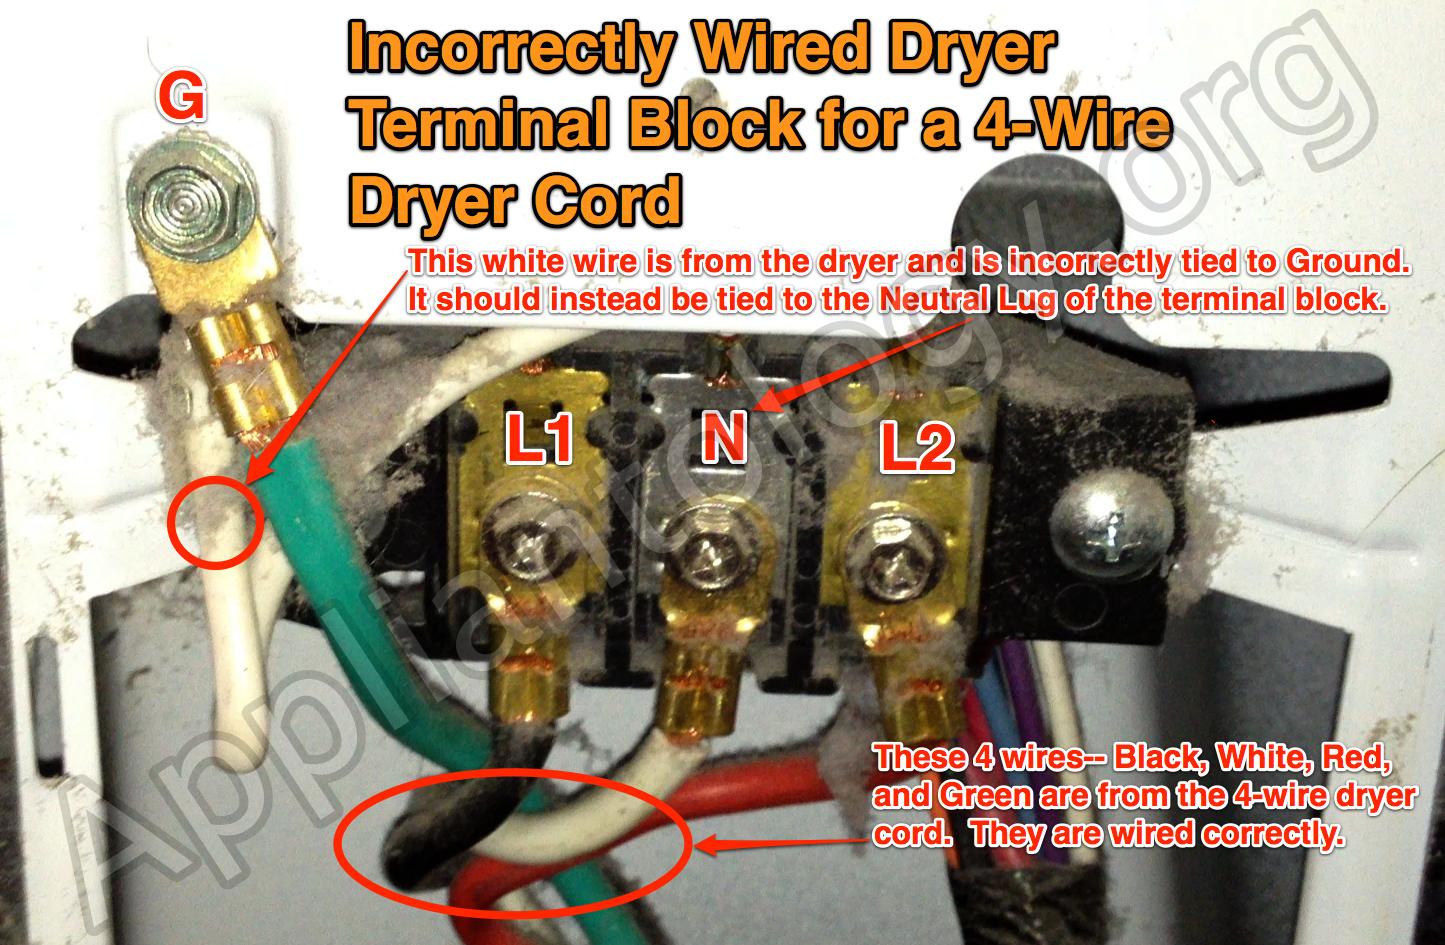 4 Wire Dryer Wiring - Data Wiring Diagram Schematic - 4 Prong Dryer Outlet Wiring Diagram